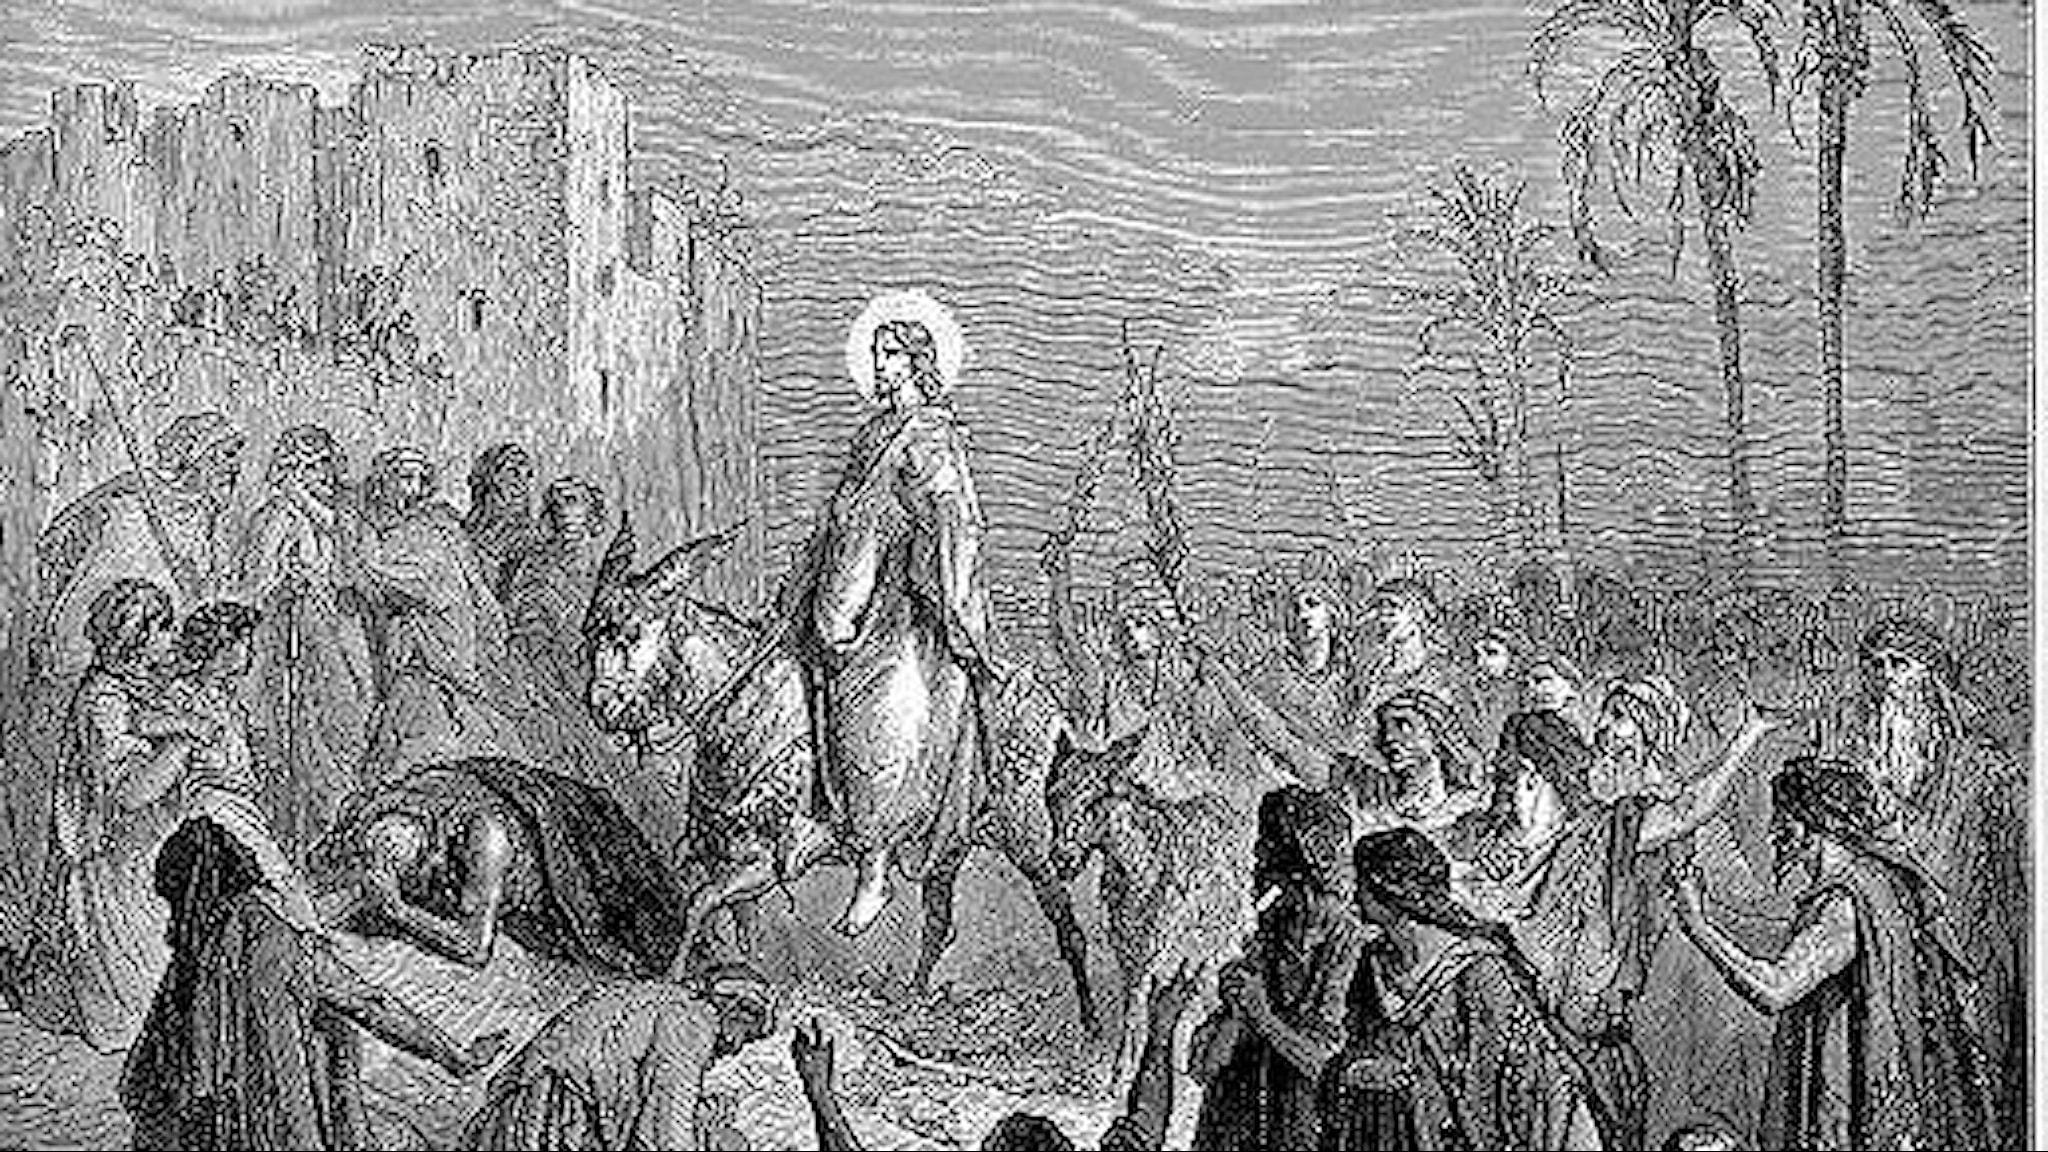 Jesus rider in i Jerusalem (Gustave Dore, 1832-83).